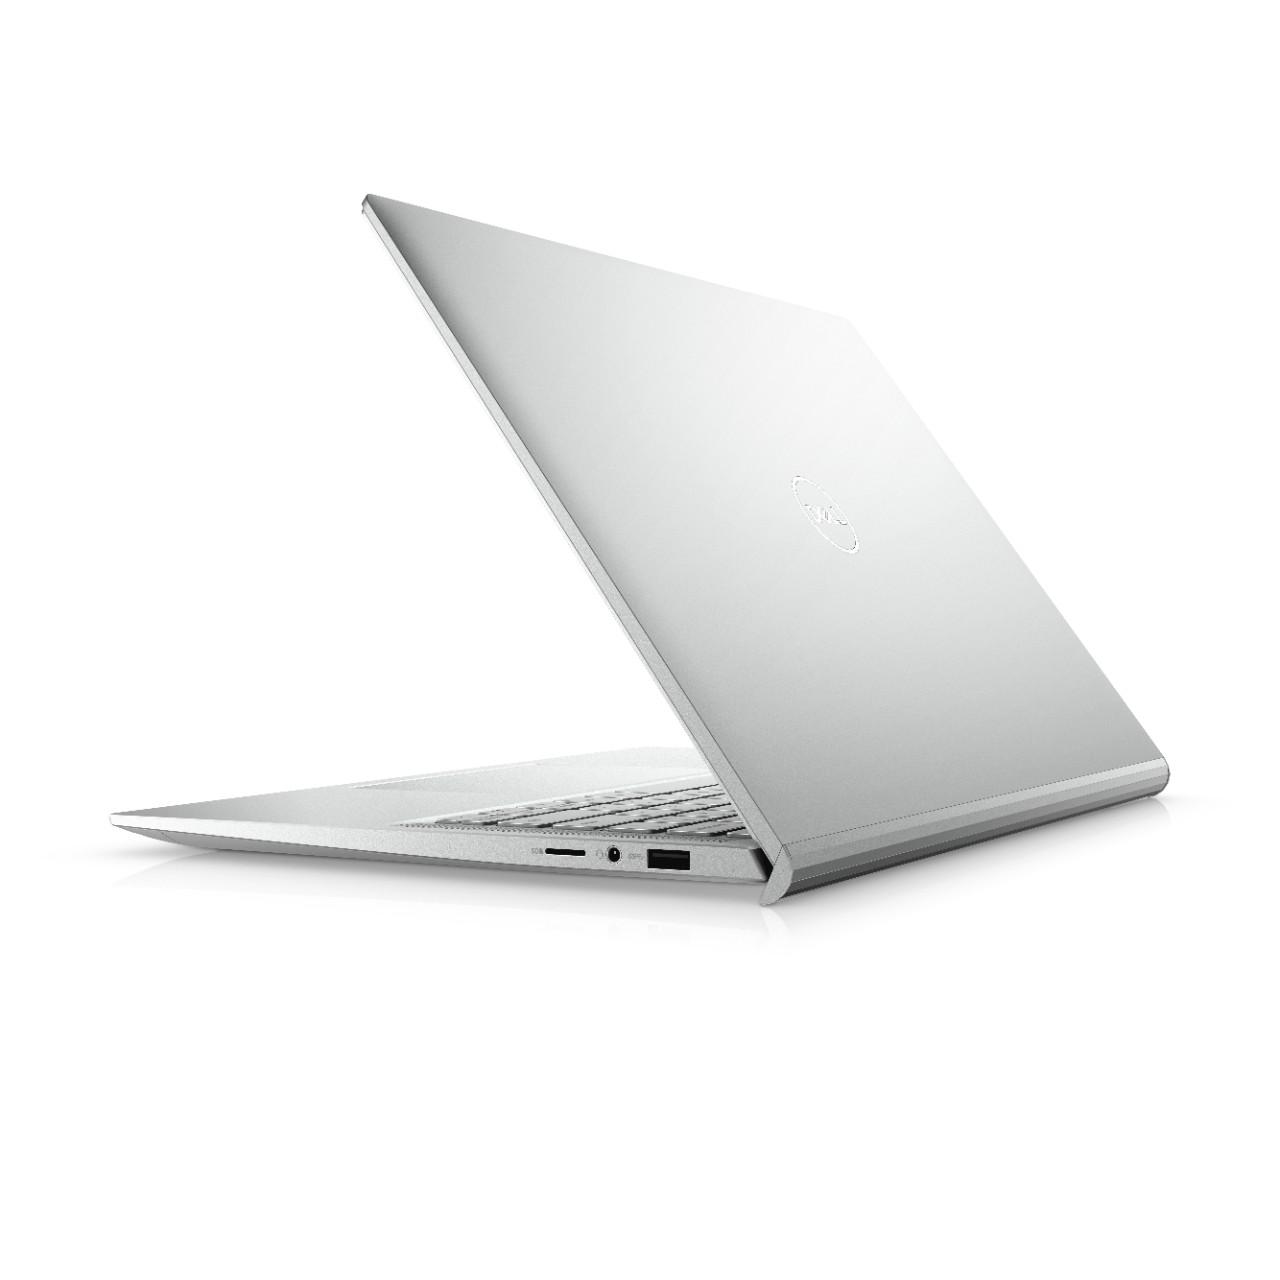 "Dell Inspiron 7400 14,5"" QHD+ i5-1135G7/8GB/512GB-SSD/FPR/MCR/HDMI/THB/W10Pro/3RNBD/Stříbrný"